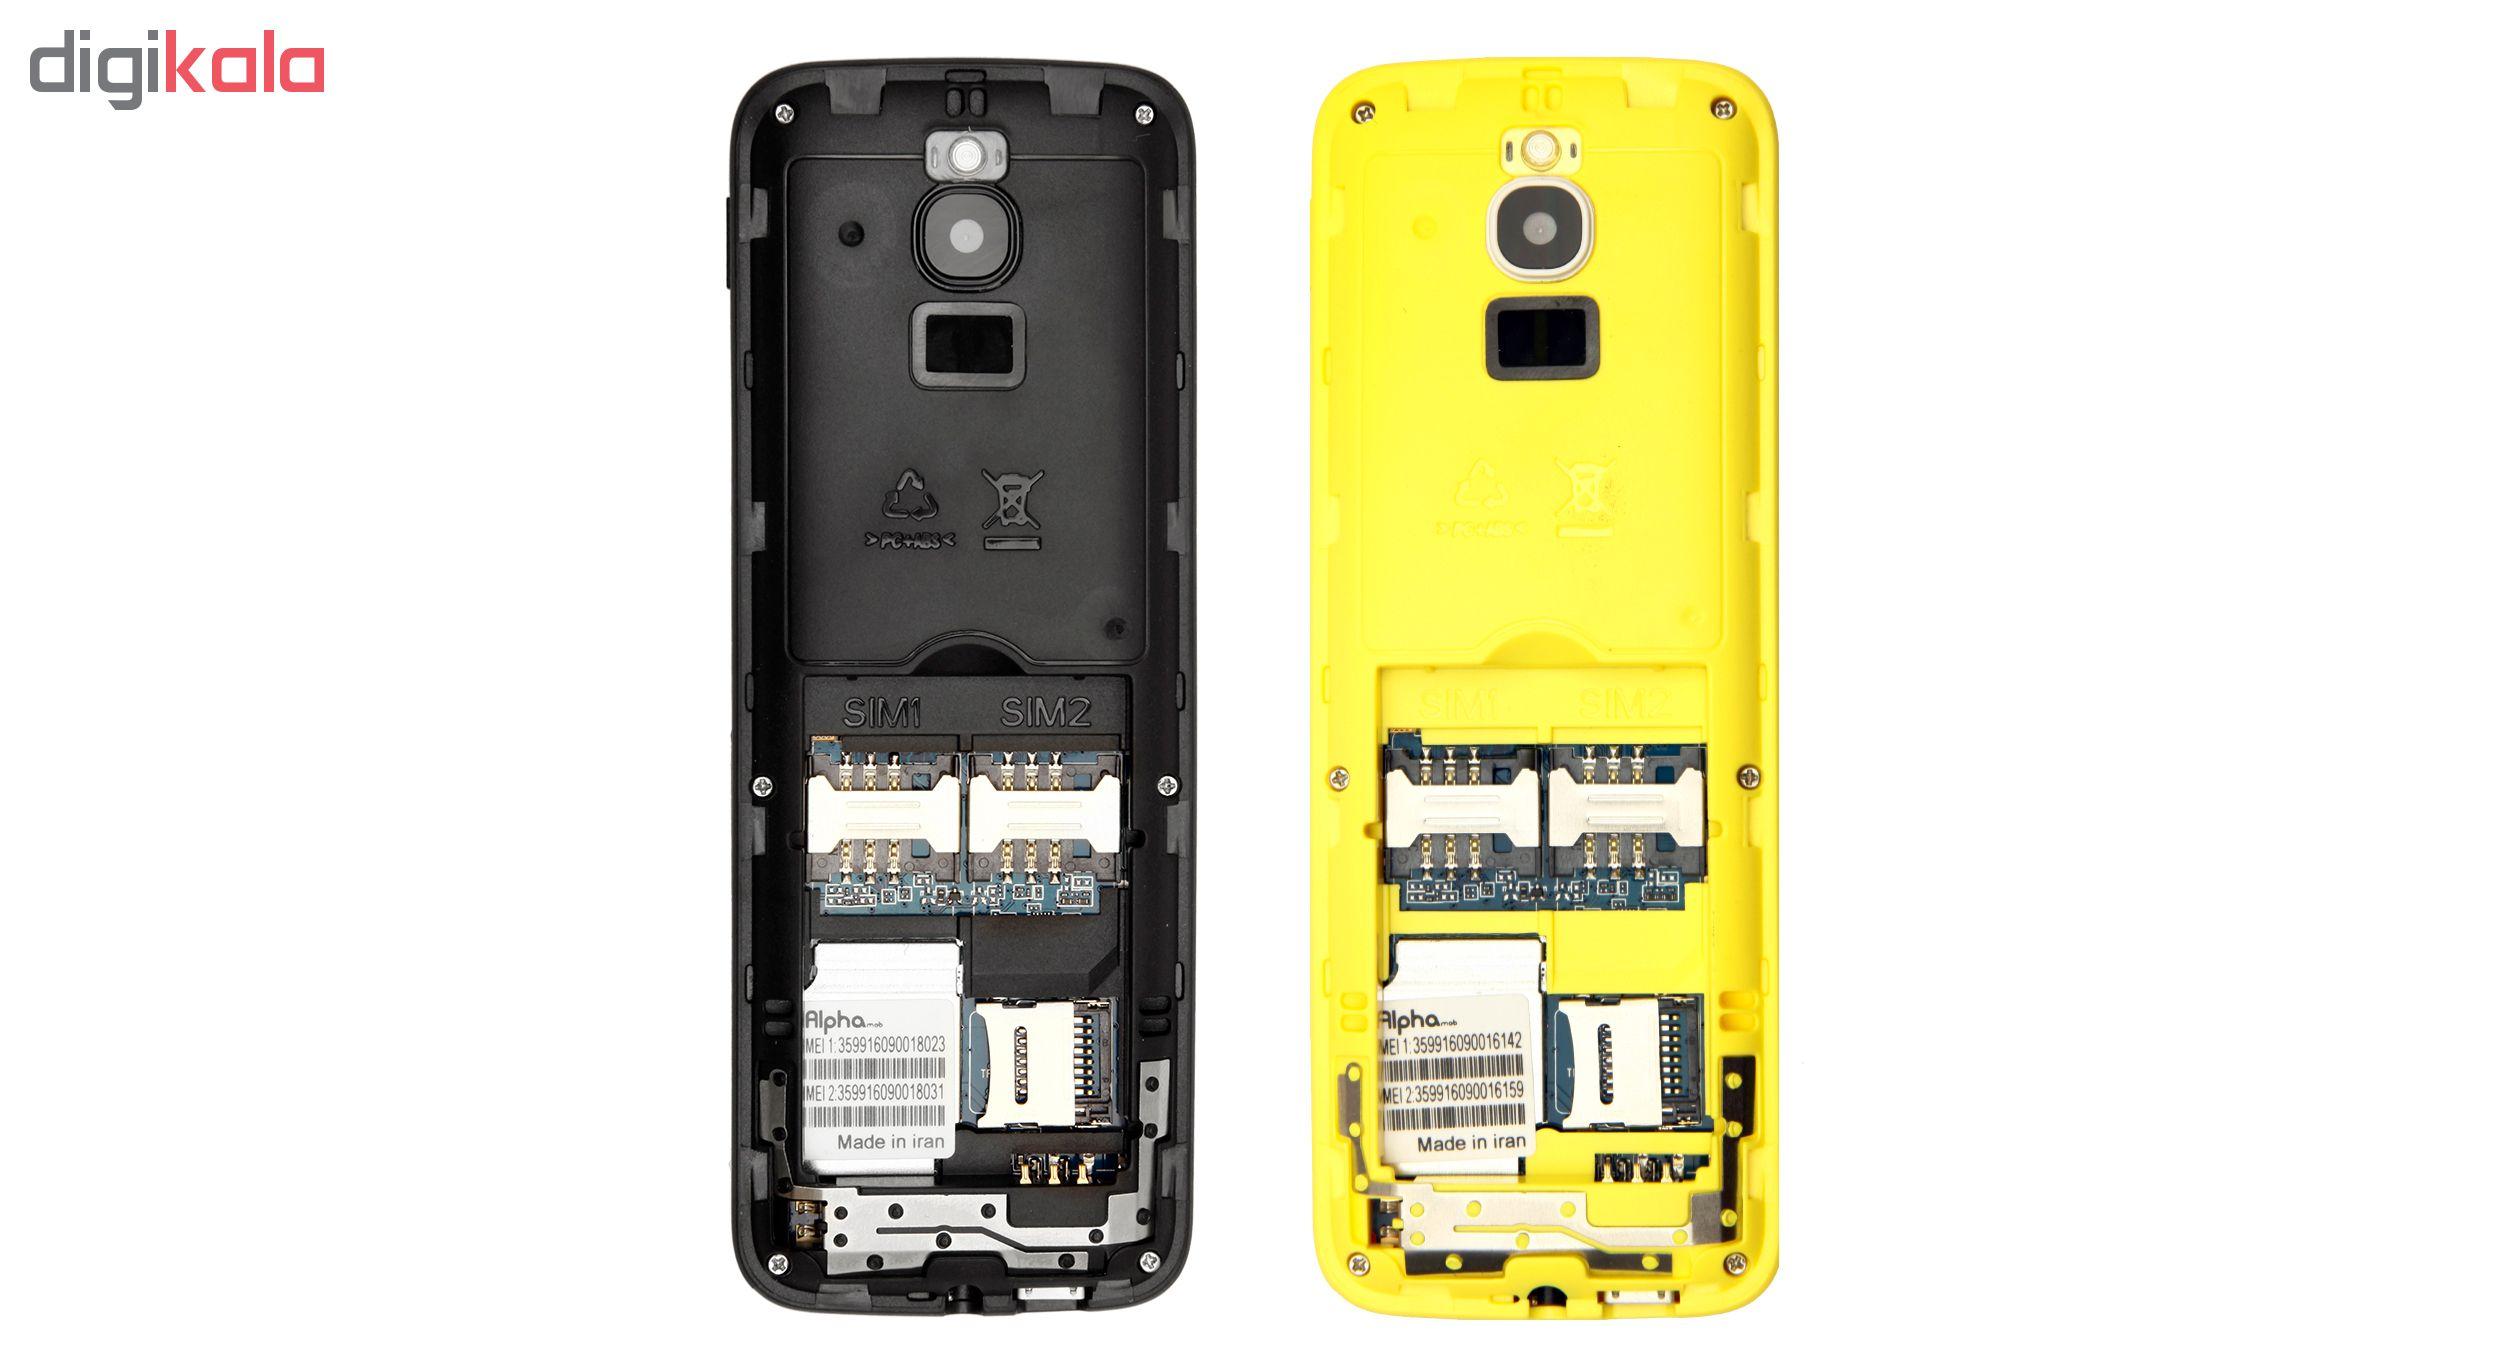 گوشی موبایل آلفاموب مدل x9 دو سیم کارت main 1 8